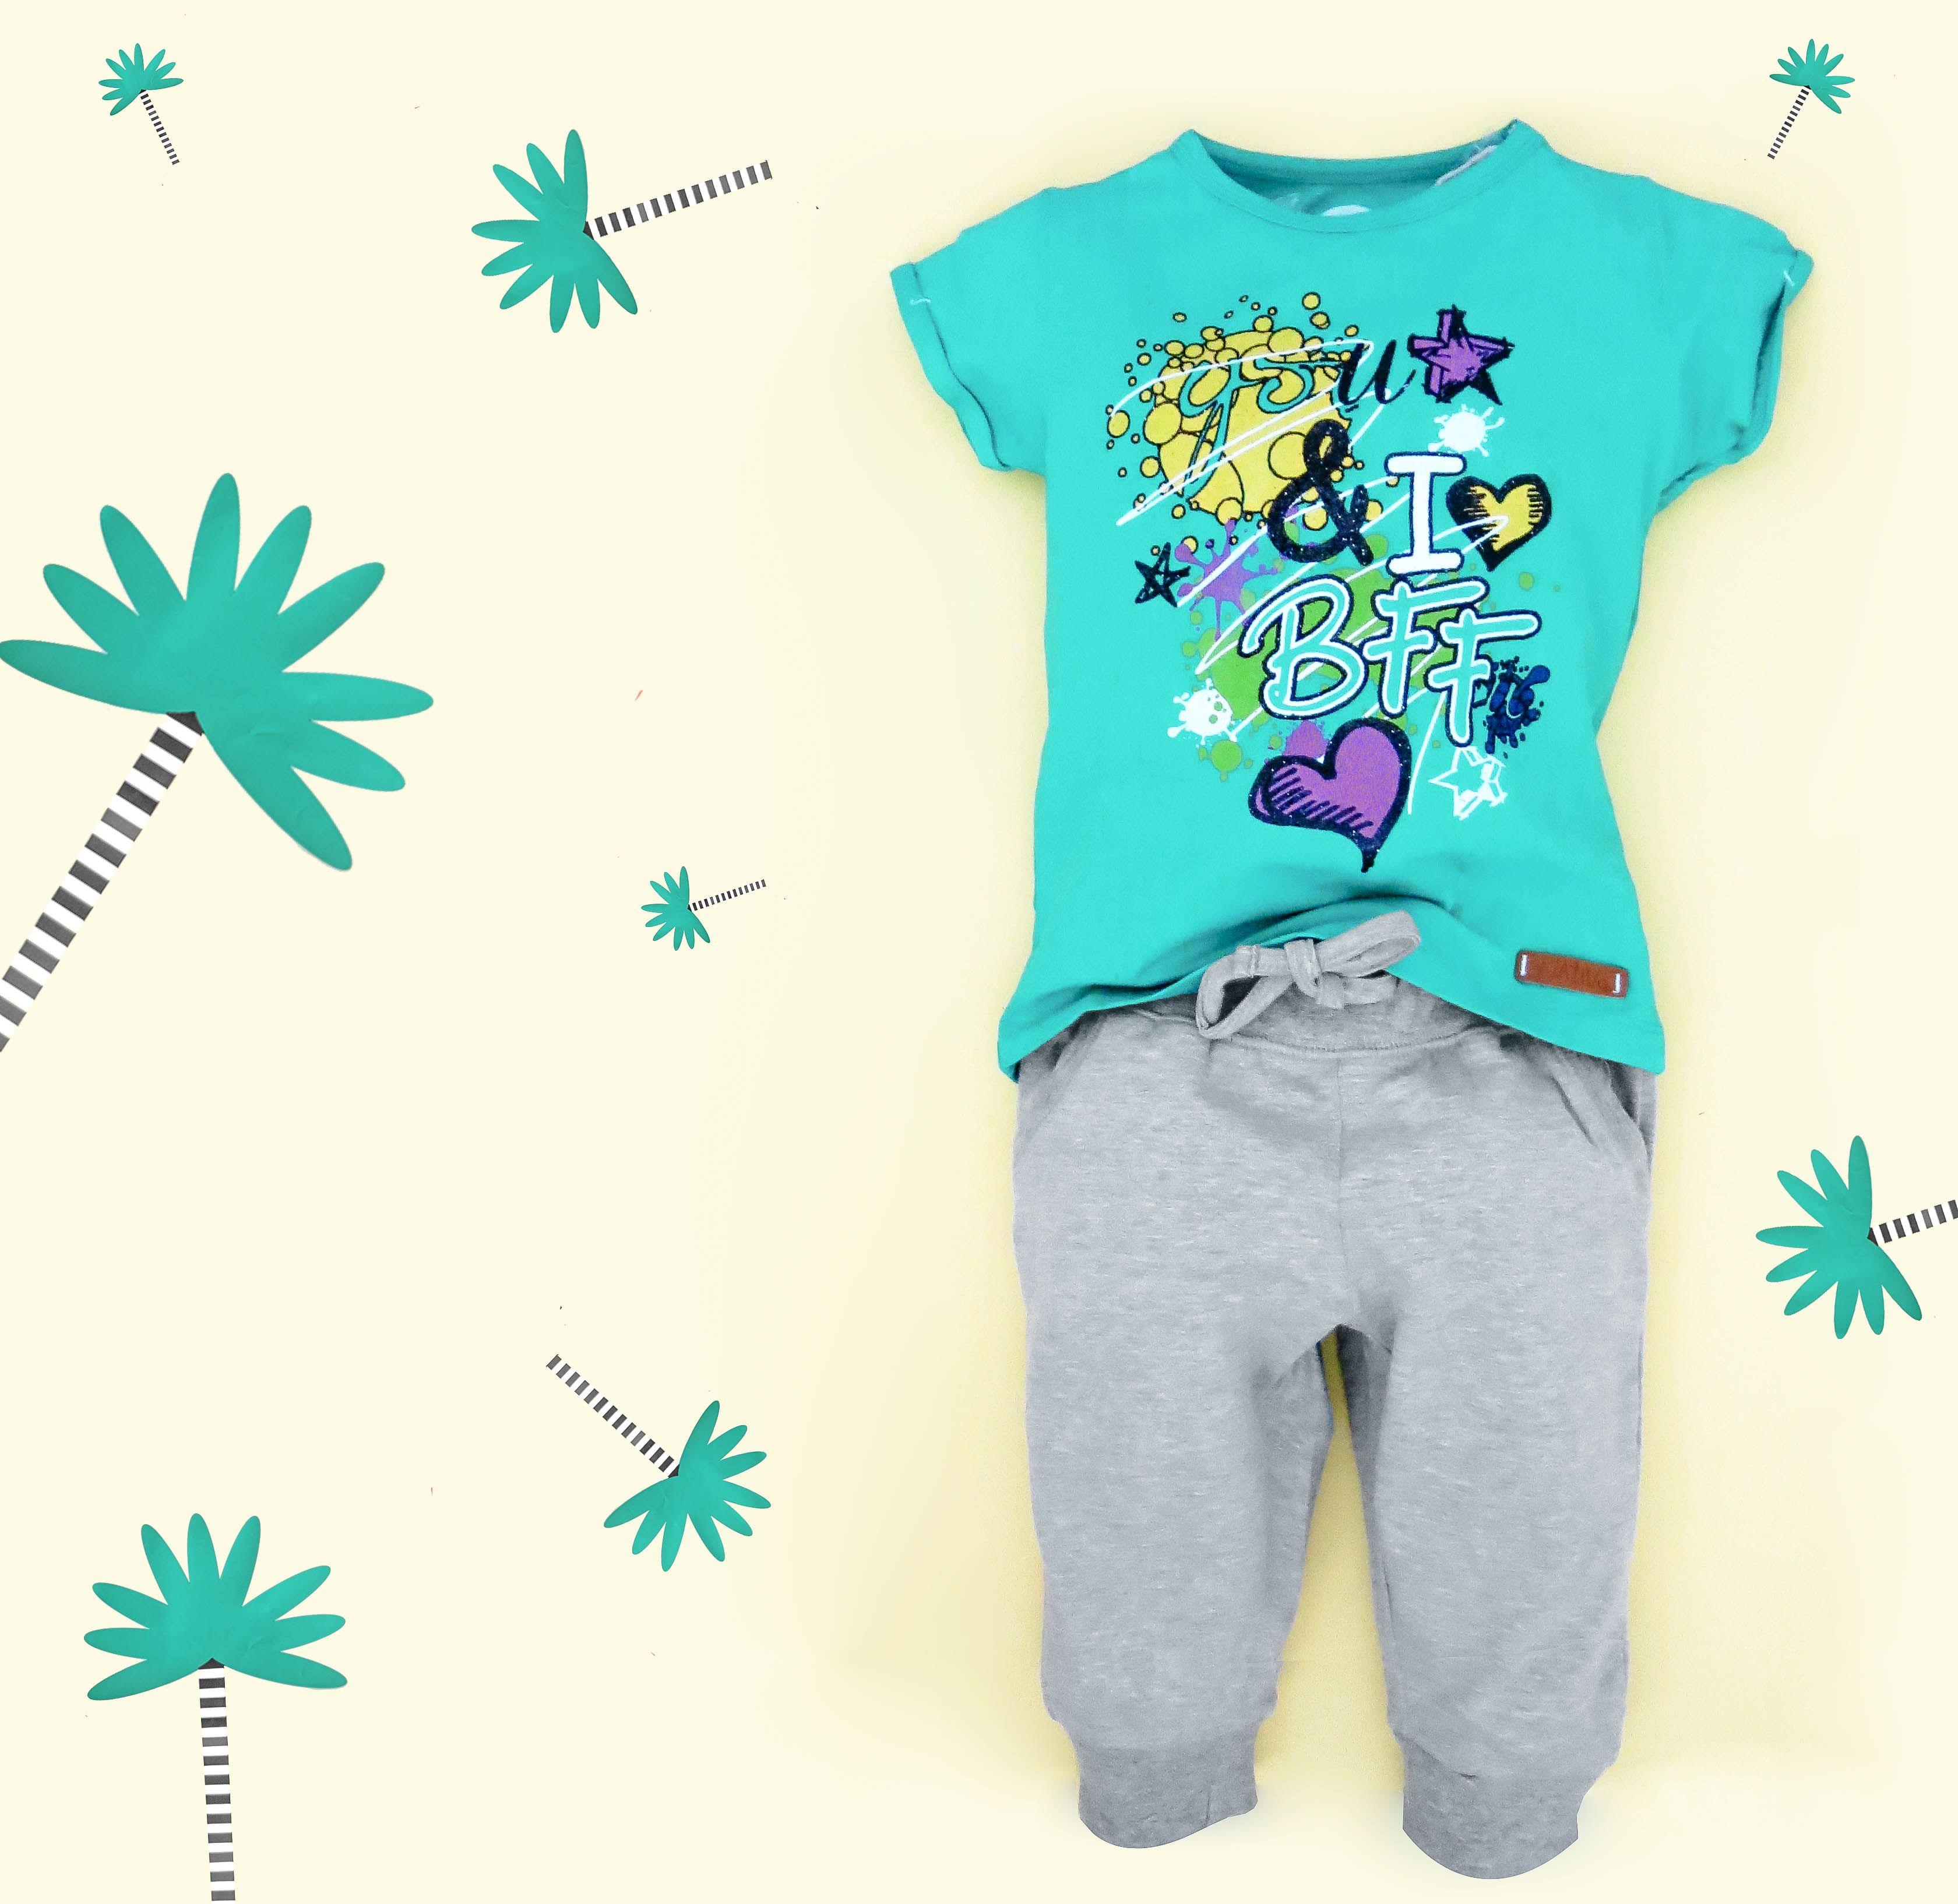 Fashion kids. Polish Design. Nativo Kids #boy #girl #new #collection #new #brand #Nativo #kids #clothes #fashion #moda #Nativo #Apparel #design #dzieci #bluza #spodnie #spódniczka #spodniczka #loki #pink #gray #shoes #love #fashionkids #photo #bird #sukienka #t-shirt #tshirt #koszulka #szorty #jeans